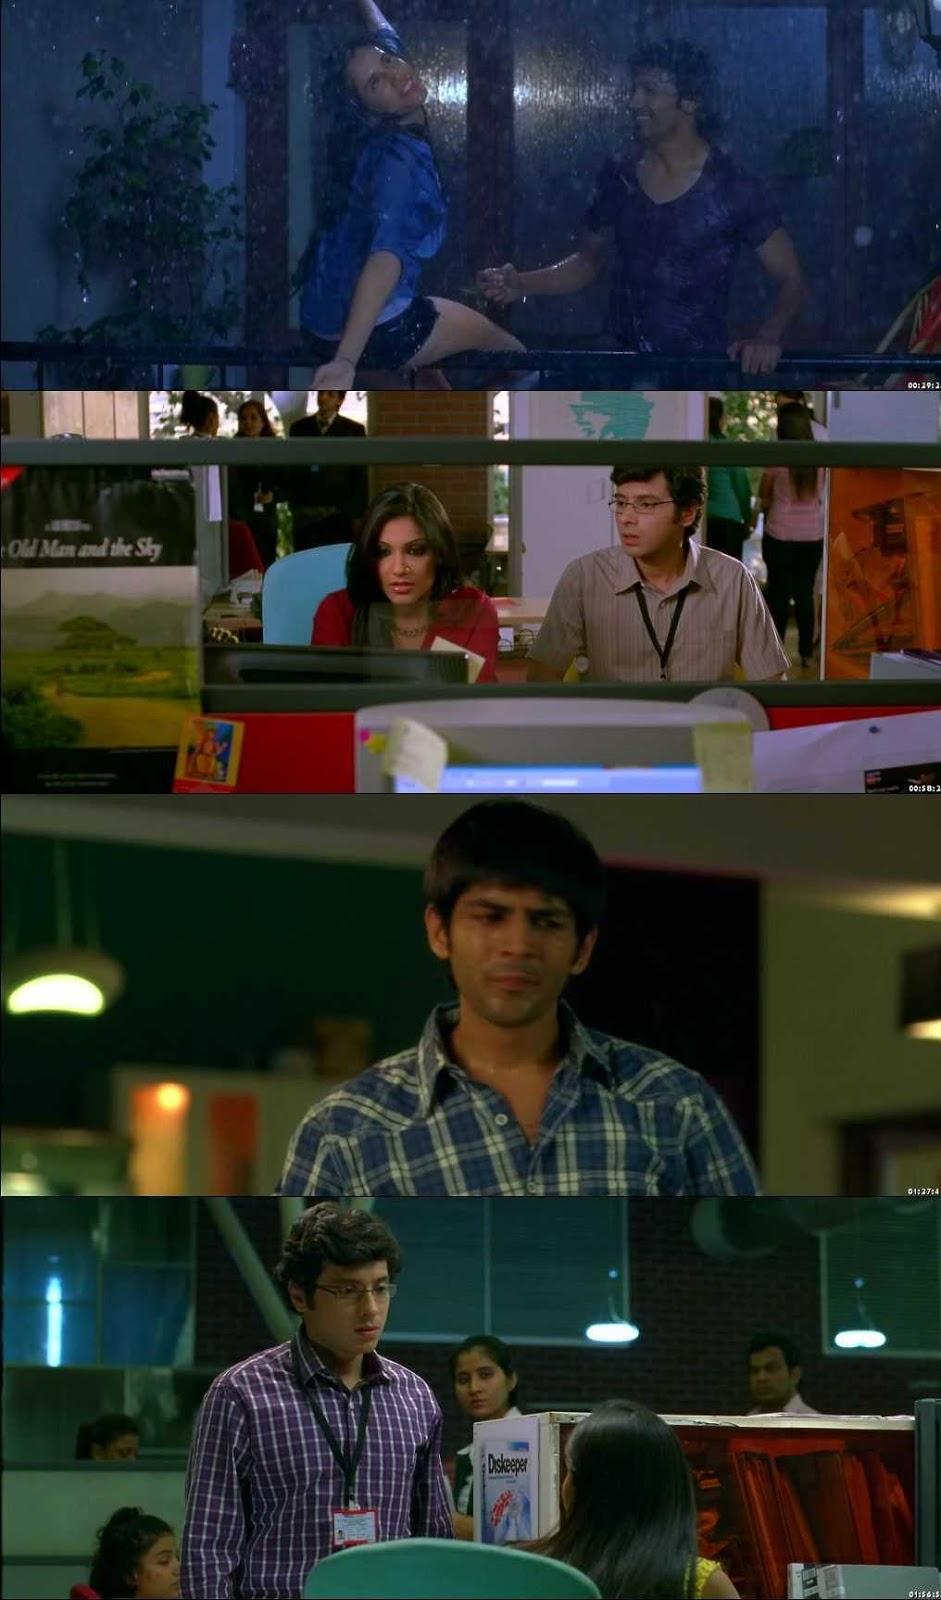 Pyaar Ka Punchnama 2011 Screenshot 1080p